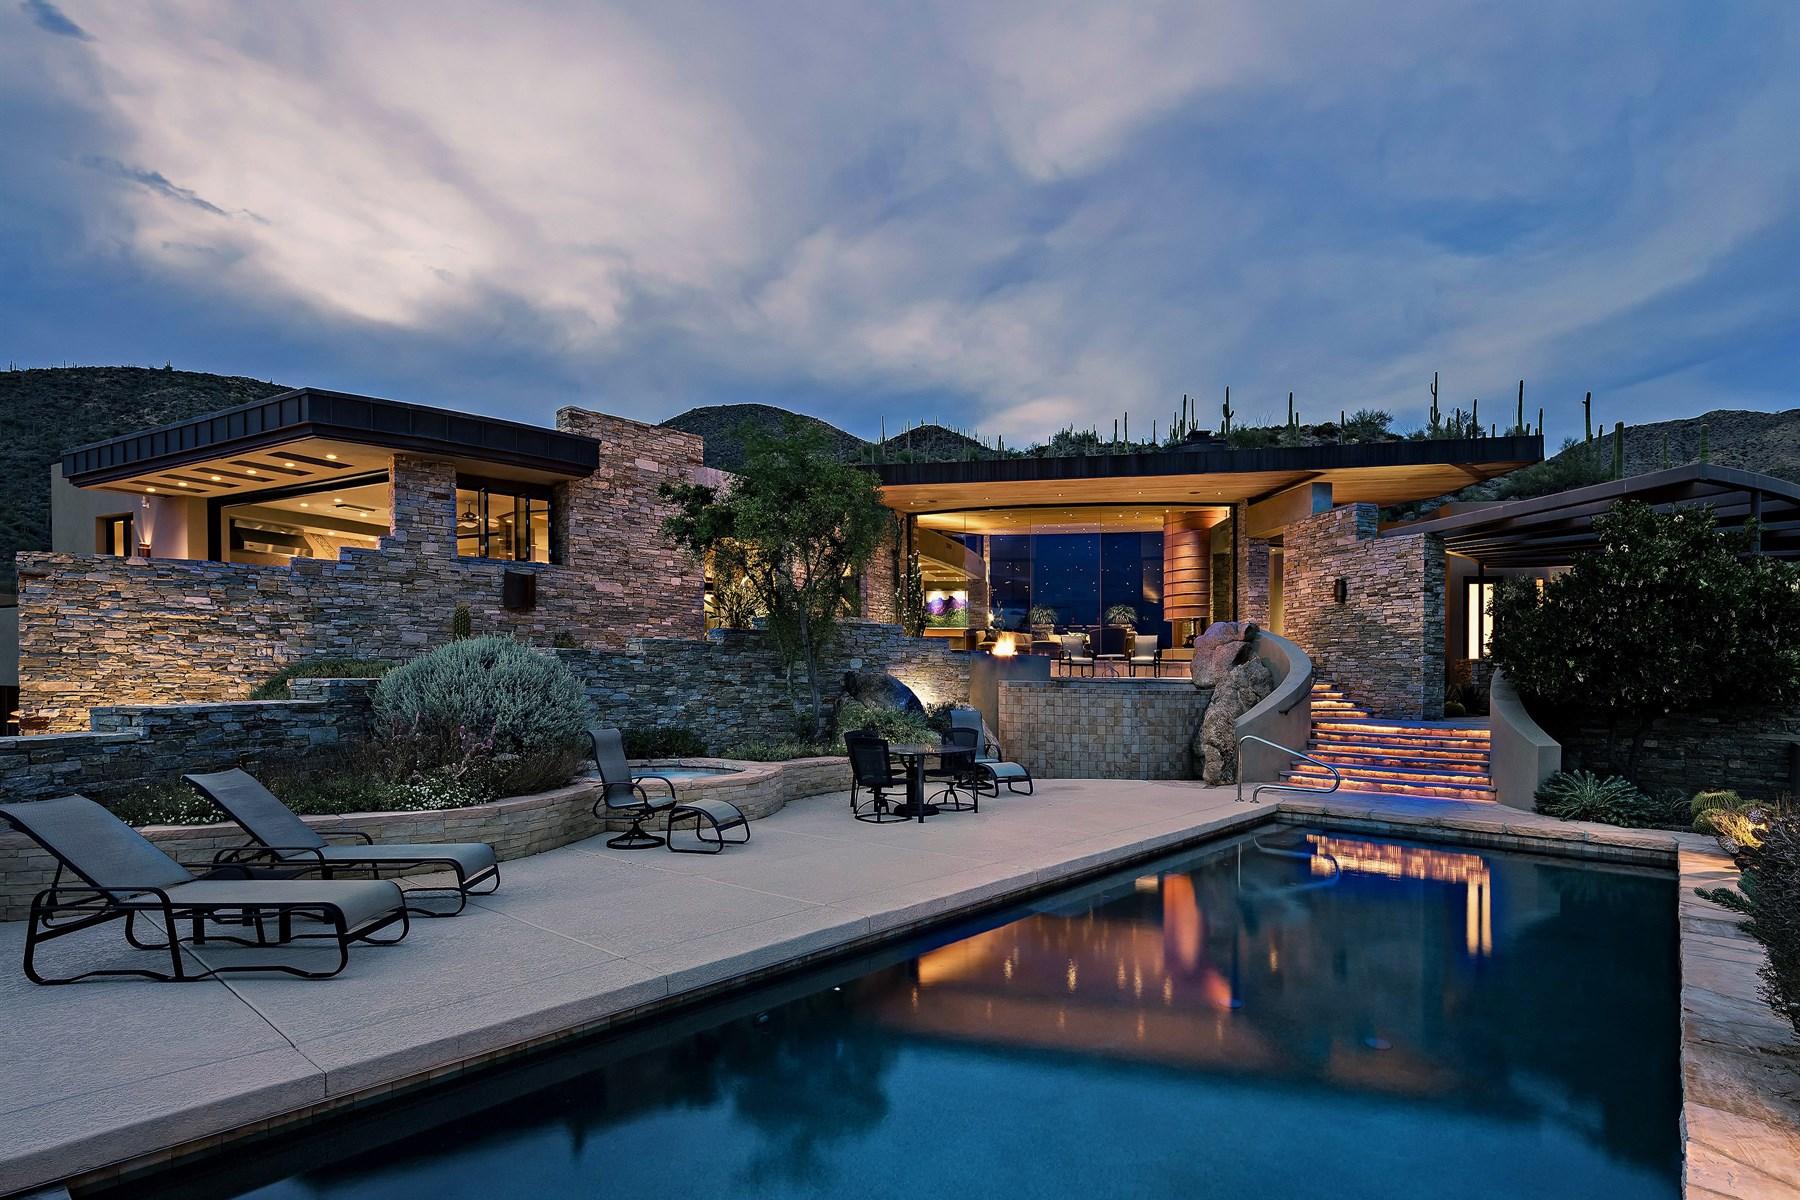 Einfamilienhaus für Verkauf beim Taliesin styled contemporary home perched at the top of Saguaro Forest. 10032 E Reflecting Mountain Way Scottsdale, Arizona, 85262 Vereinigte Staaten